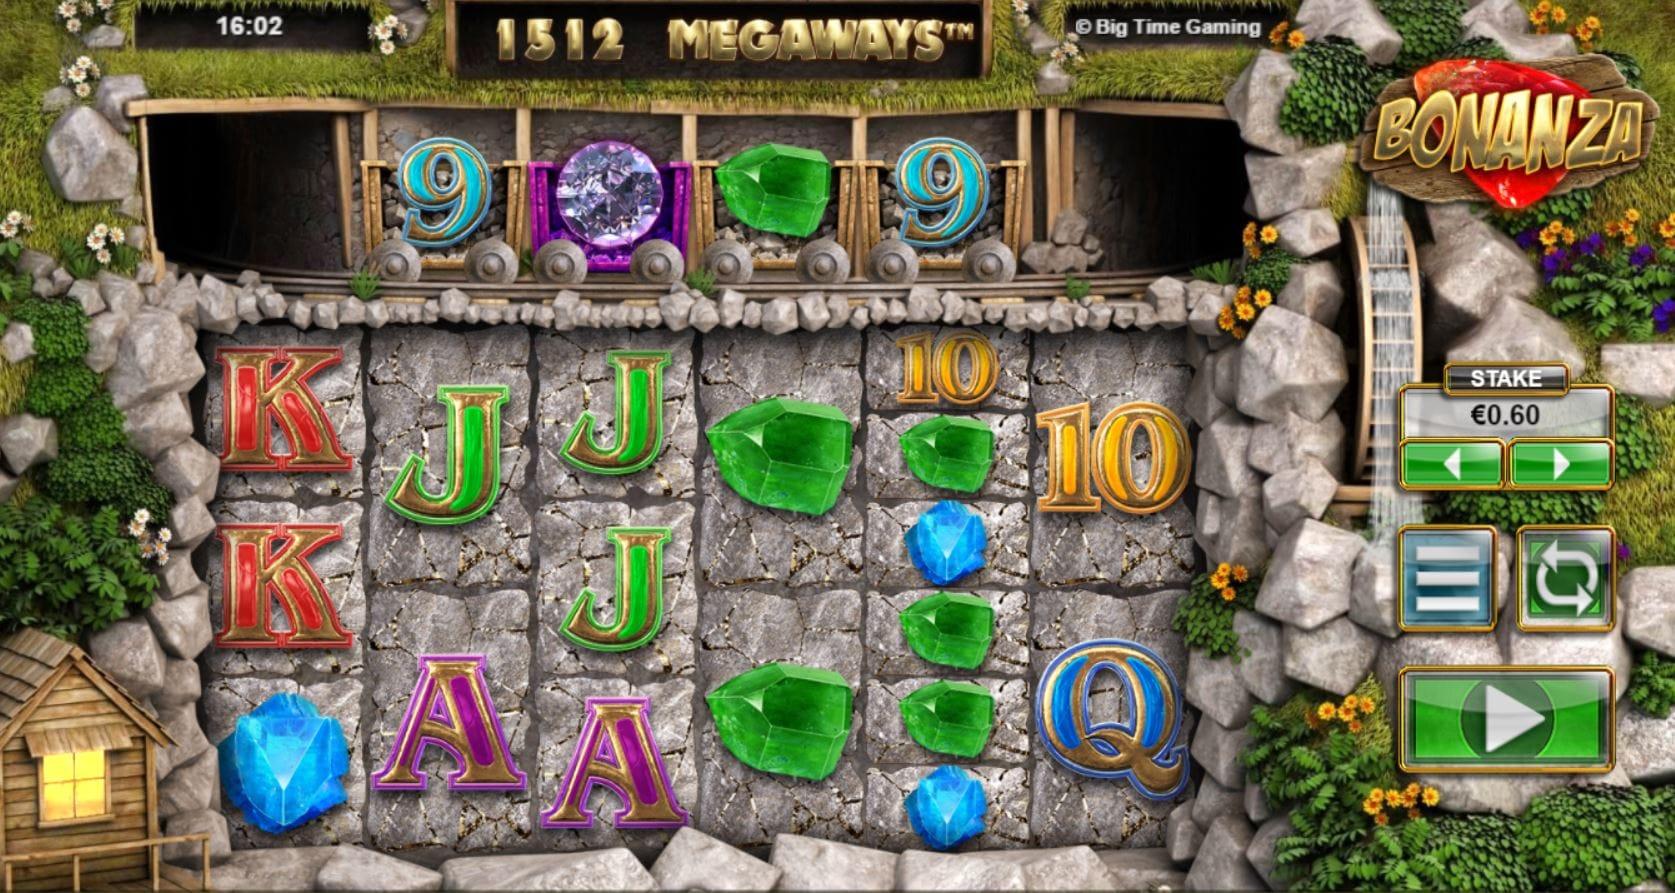 bonanza slots Gameplay